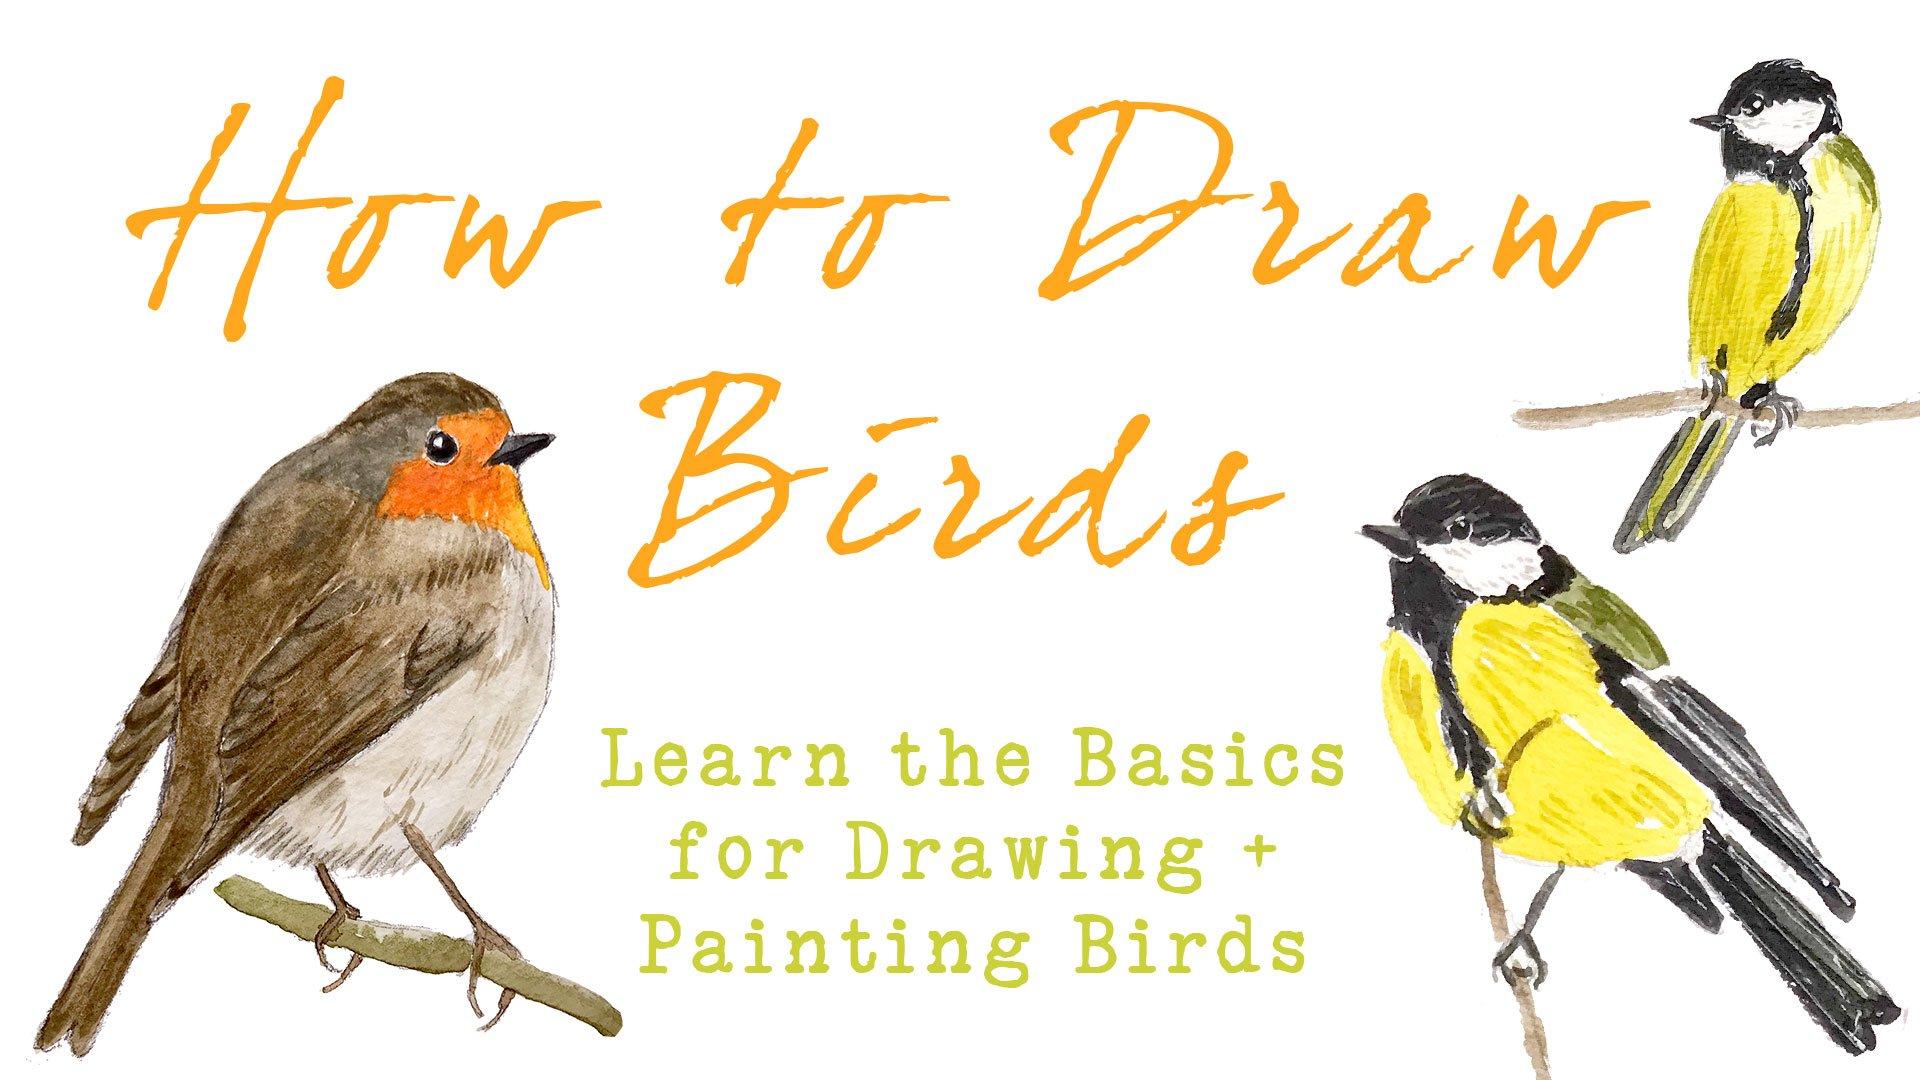 How to draw birds basic techniques for drawing painting birds julia bausenhardt skillshare